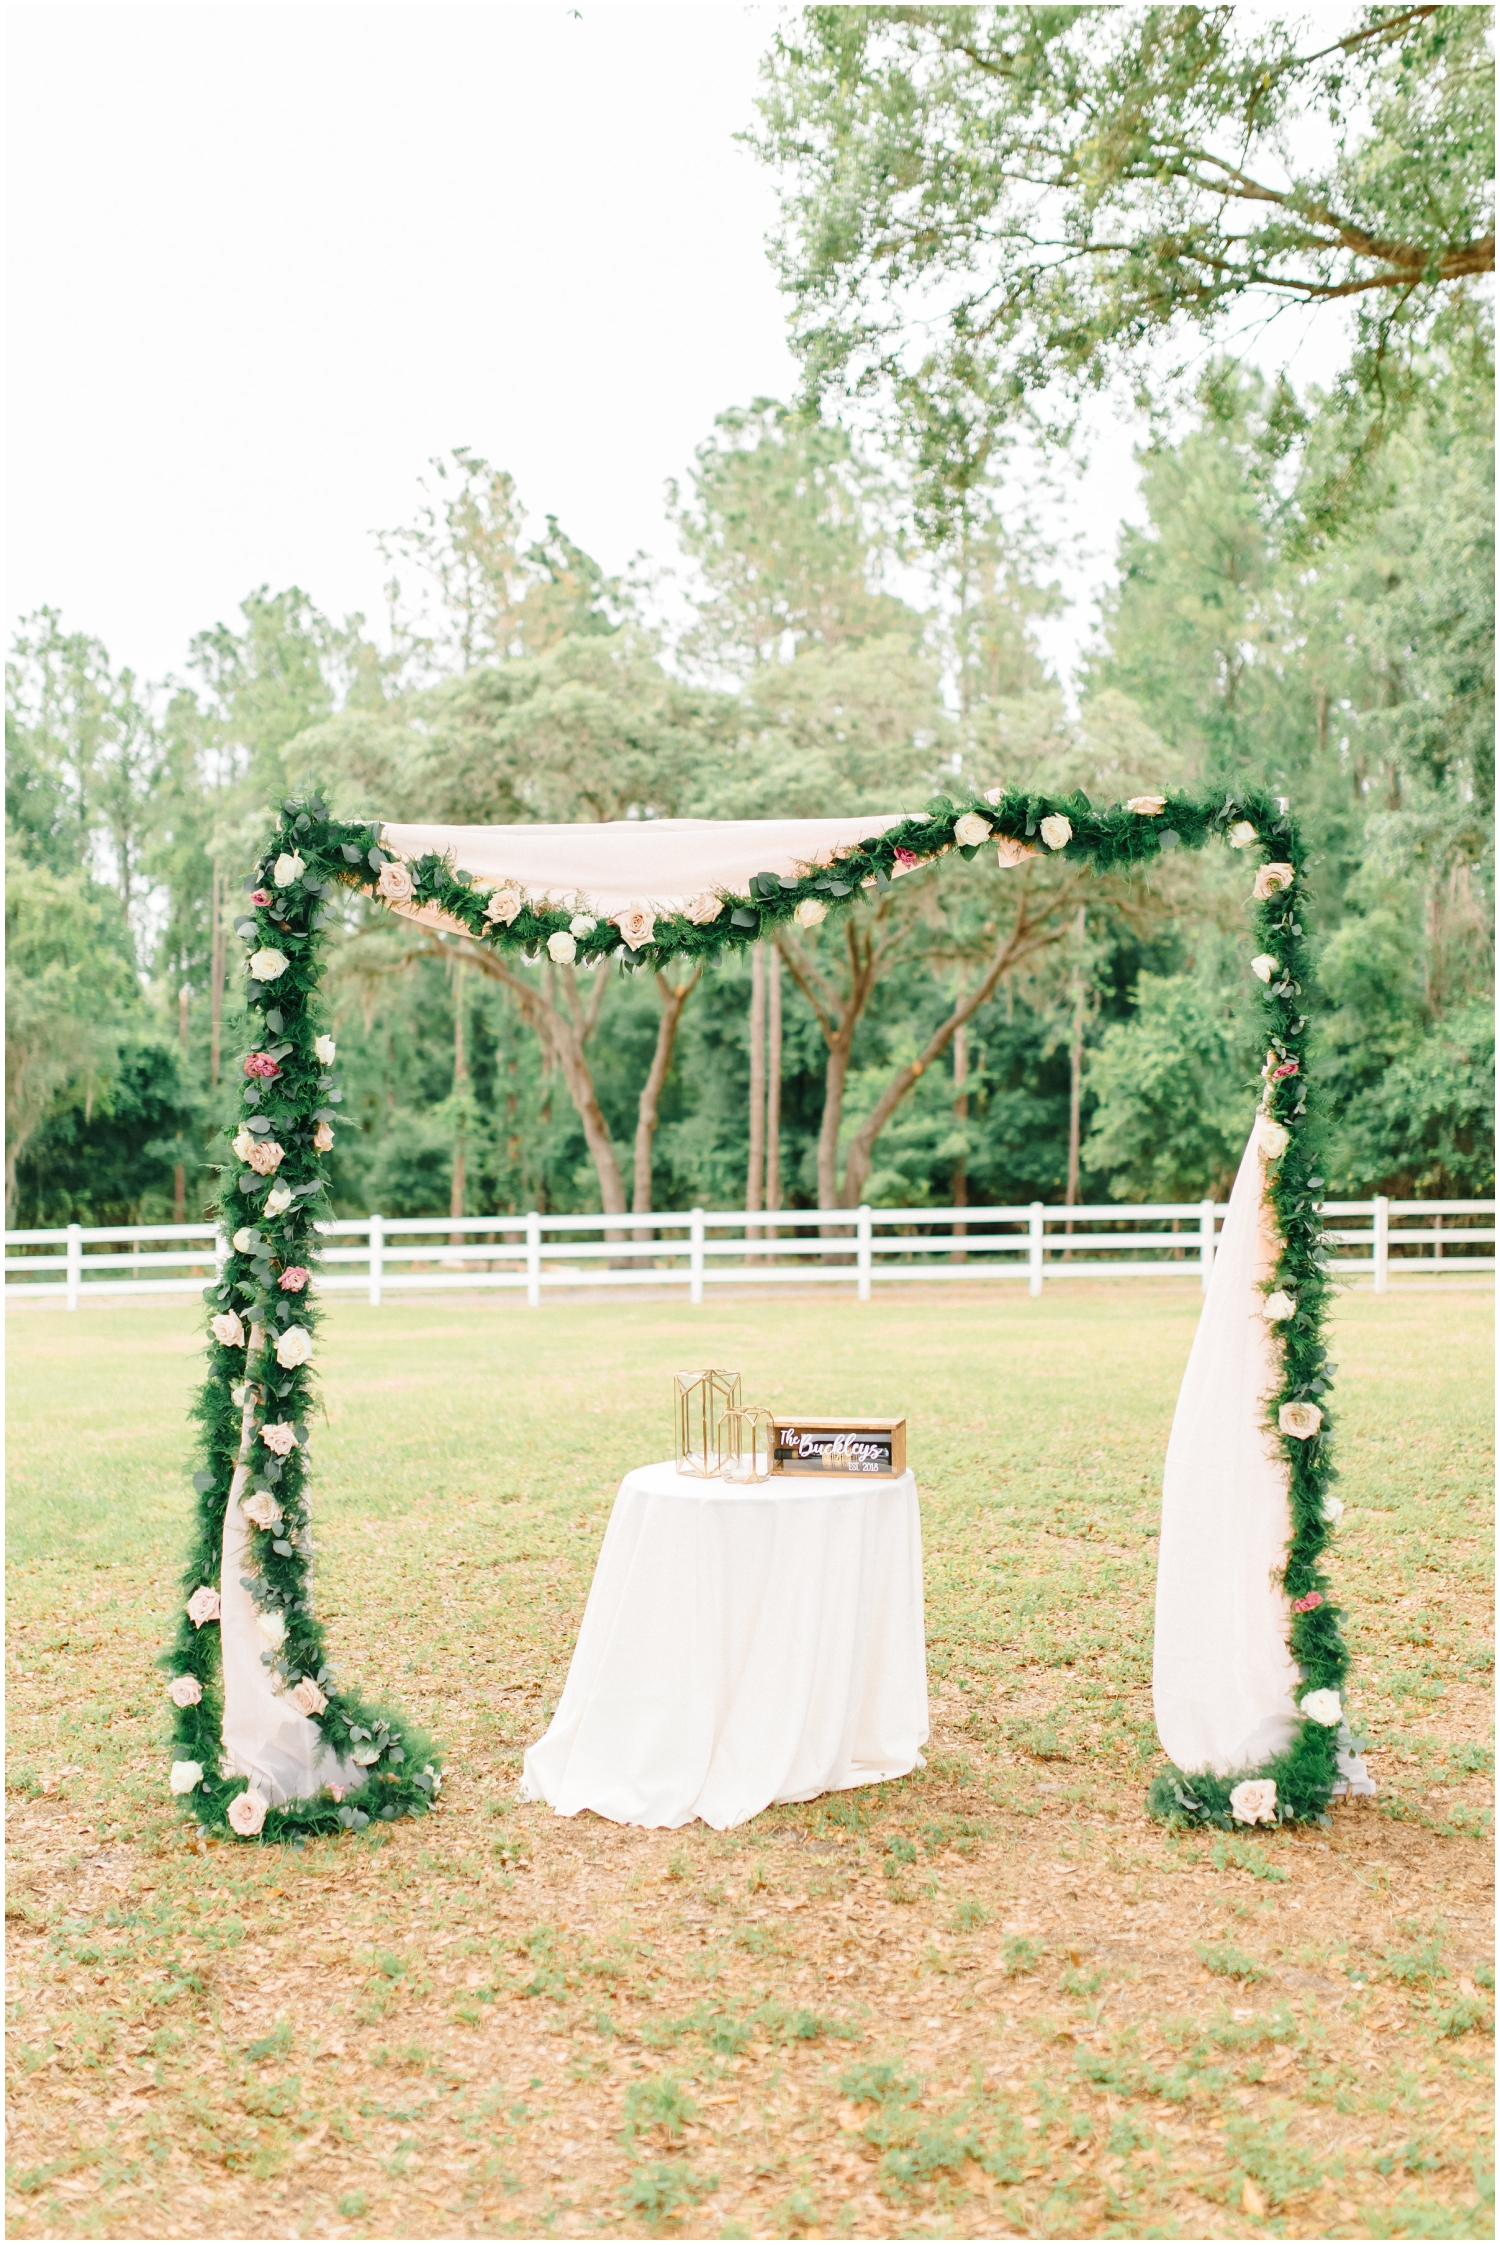 Outdoor wedding arch inspiration